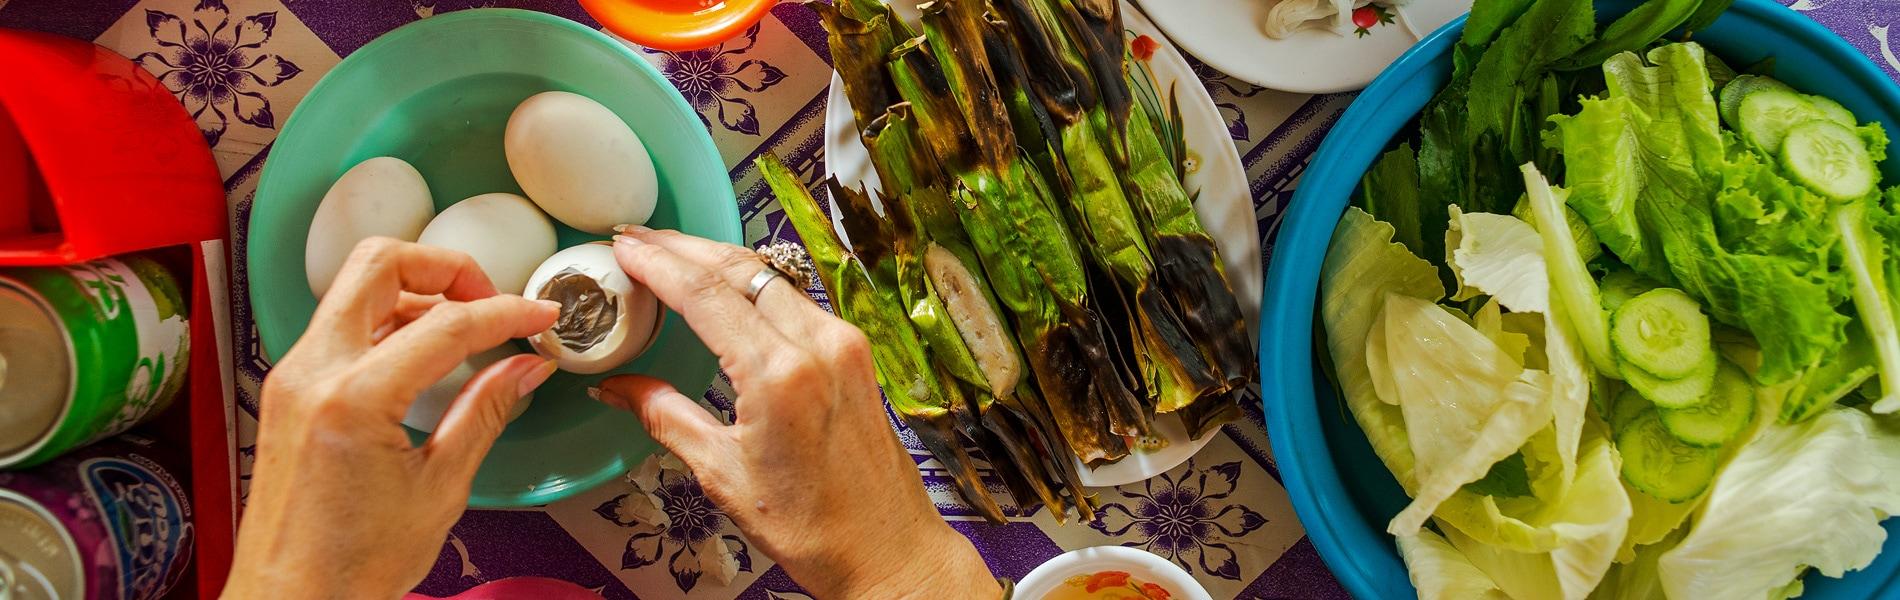 Street food in Battambang. Copyright © 2016 Siem Reap Retreats 2016. All Rights Reserved.